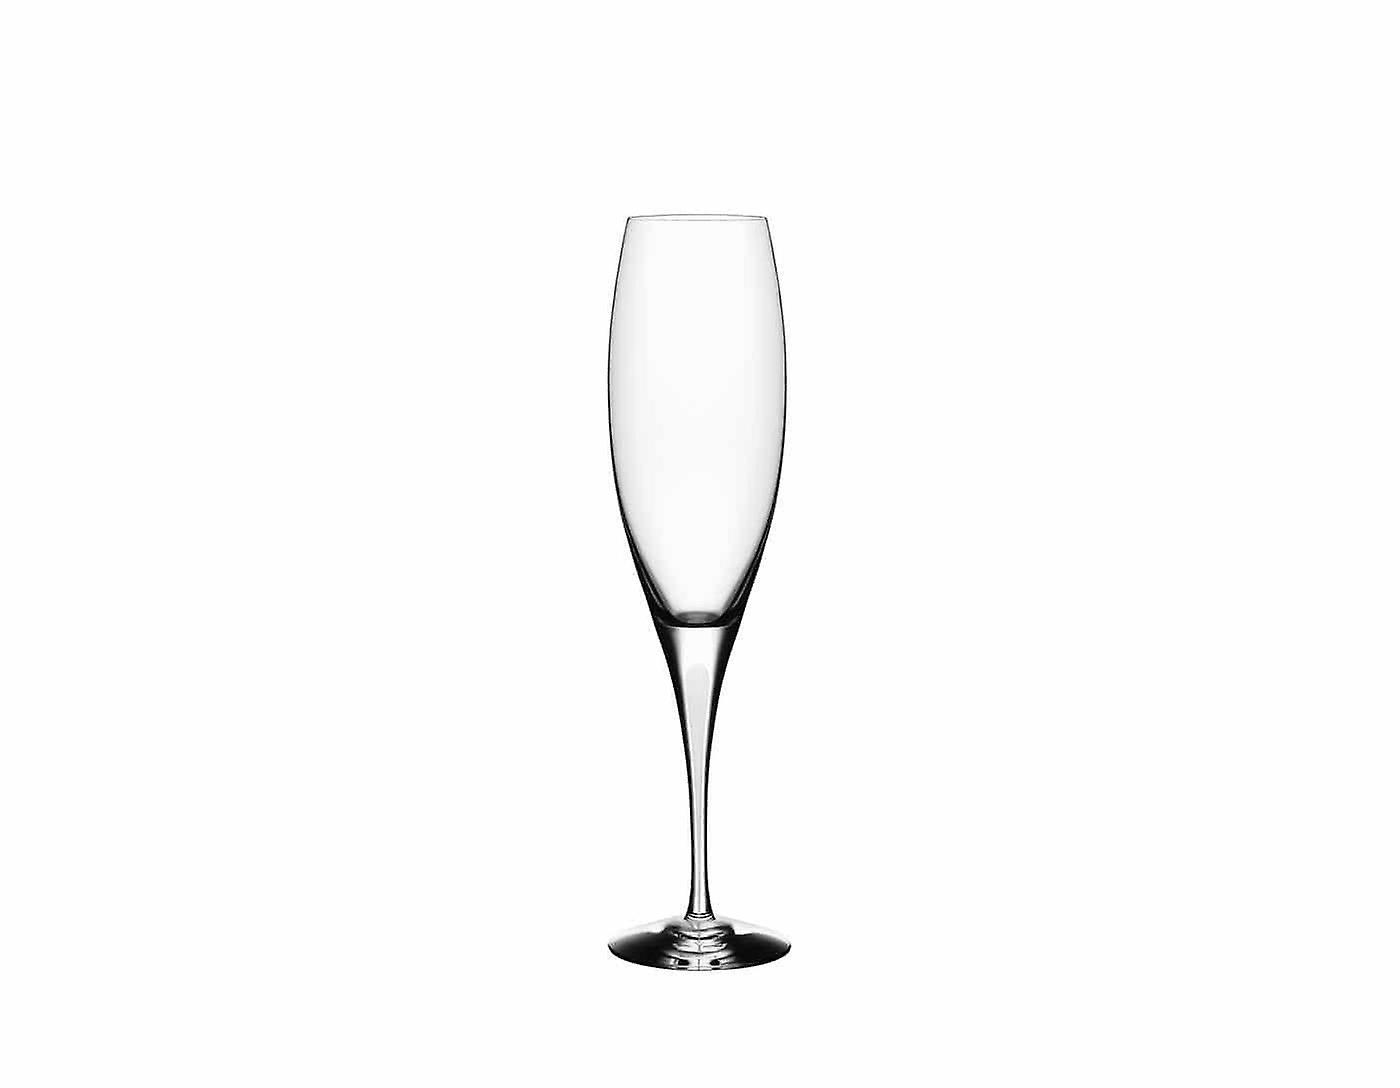 Orrefors-Intermezzo Satin 6 pcs champagne glass Design Erika Lagerbielke